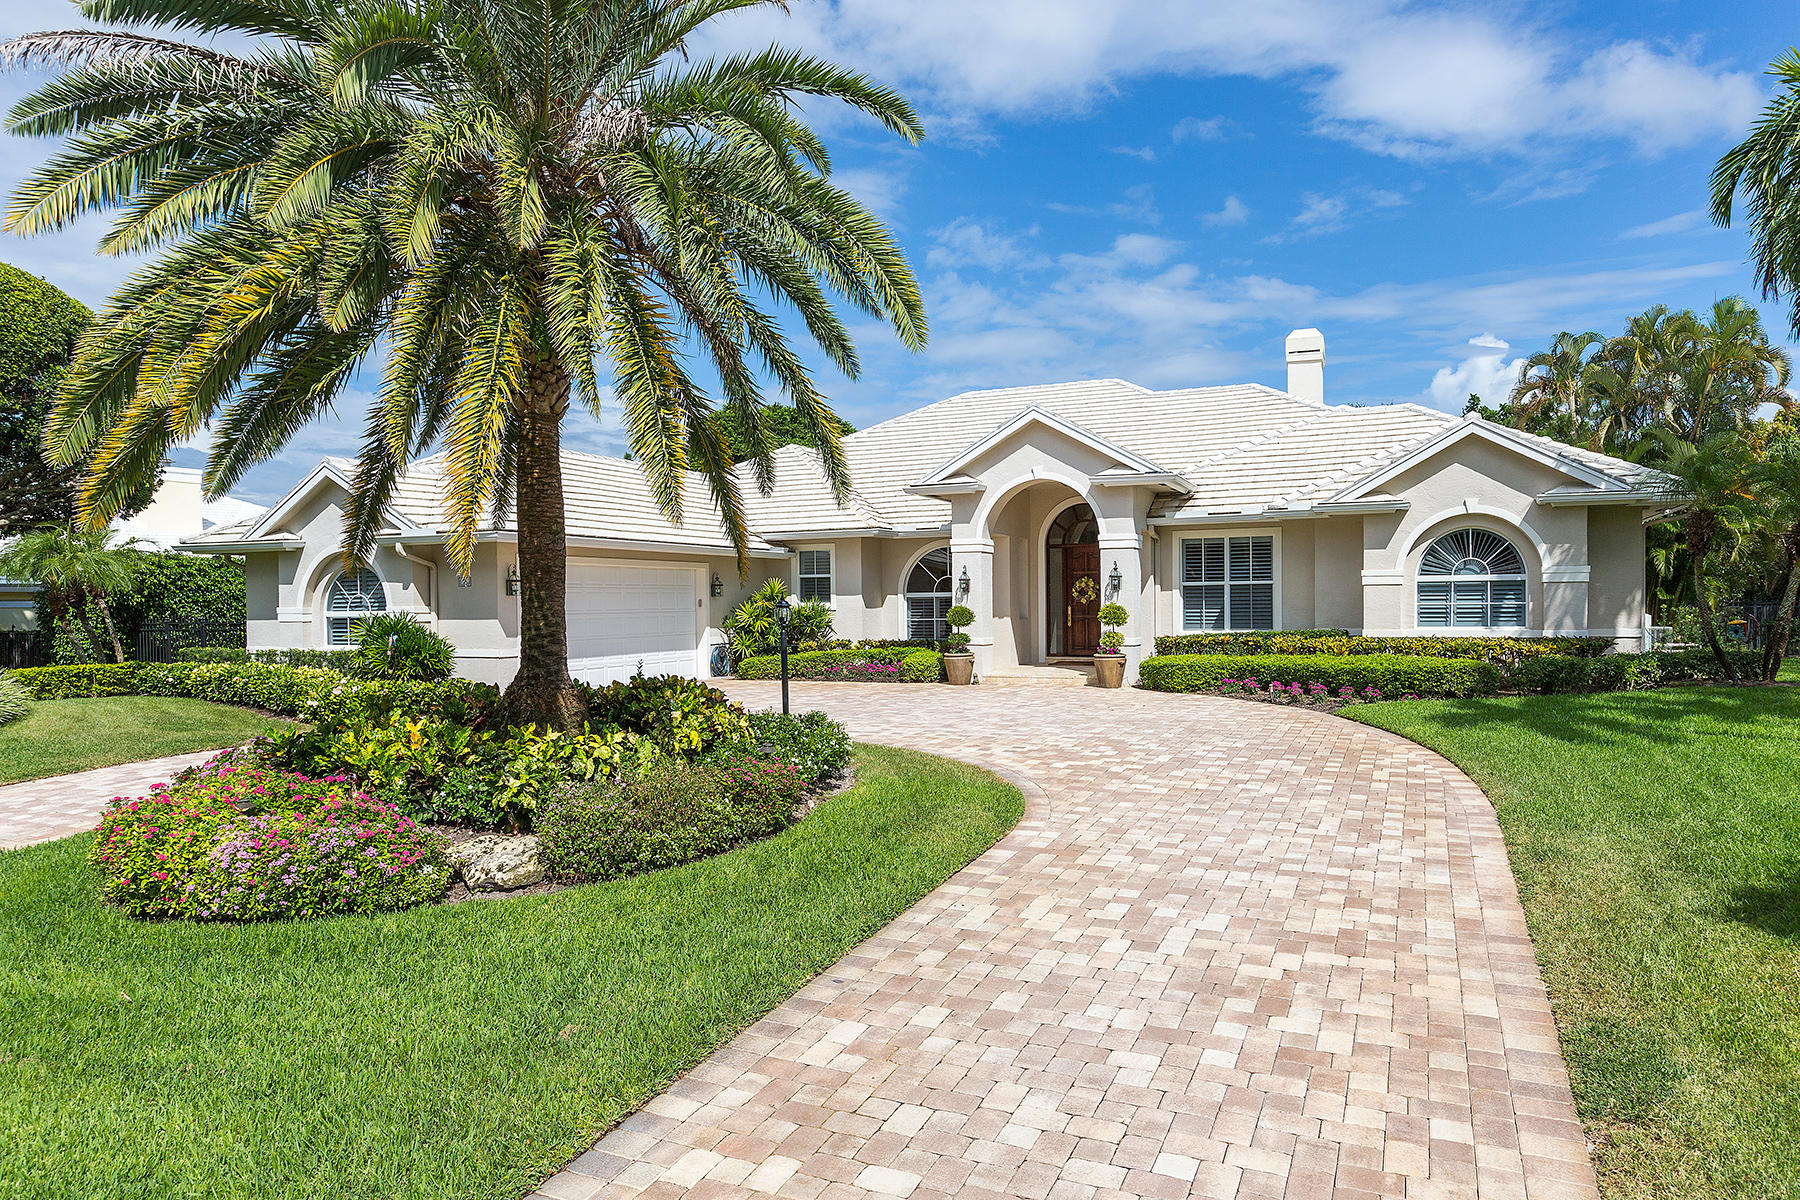 10860 Gleneagles Road, Boynton Beach, Florida 33436, 4 Bedrooms Bedrooms, ,3.1 BathroomsBathrooms,Single Family,For Sale,Pine Tree Country Club Estates,Gleneagles,RX-10481447